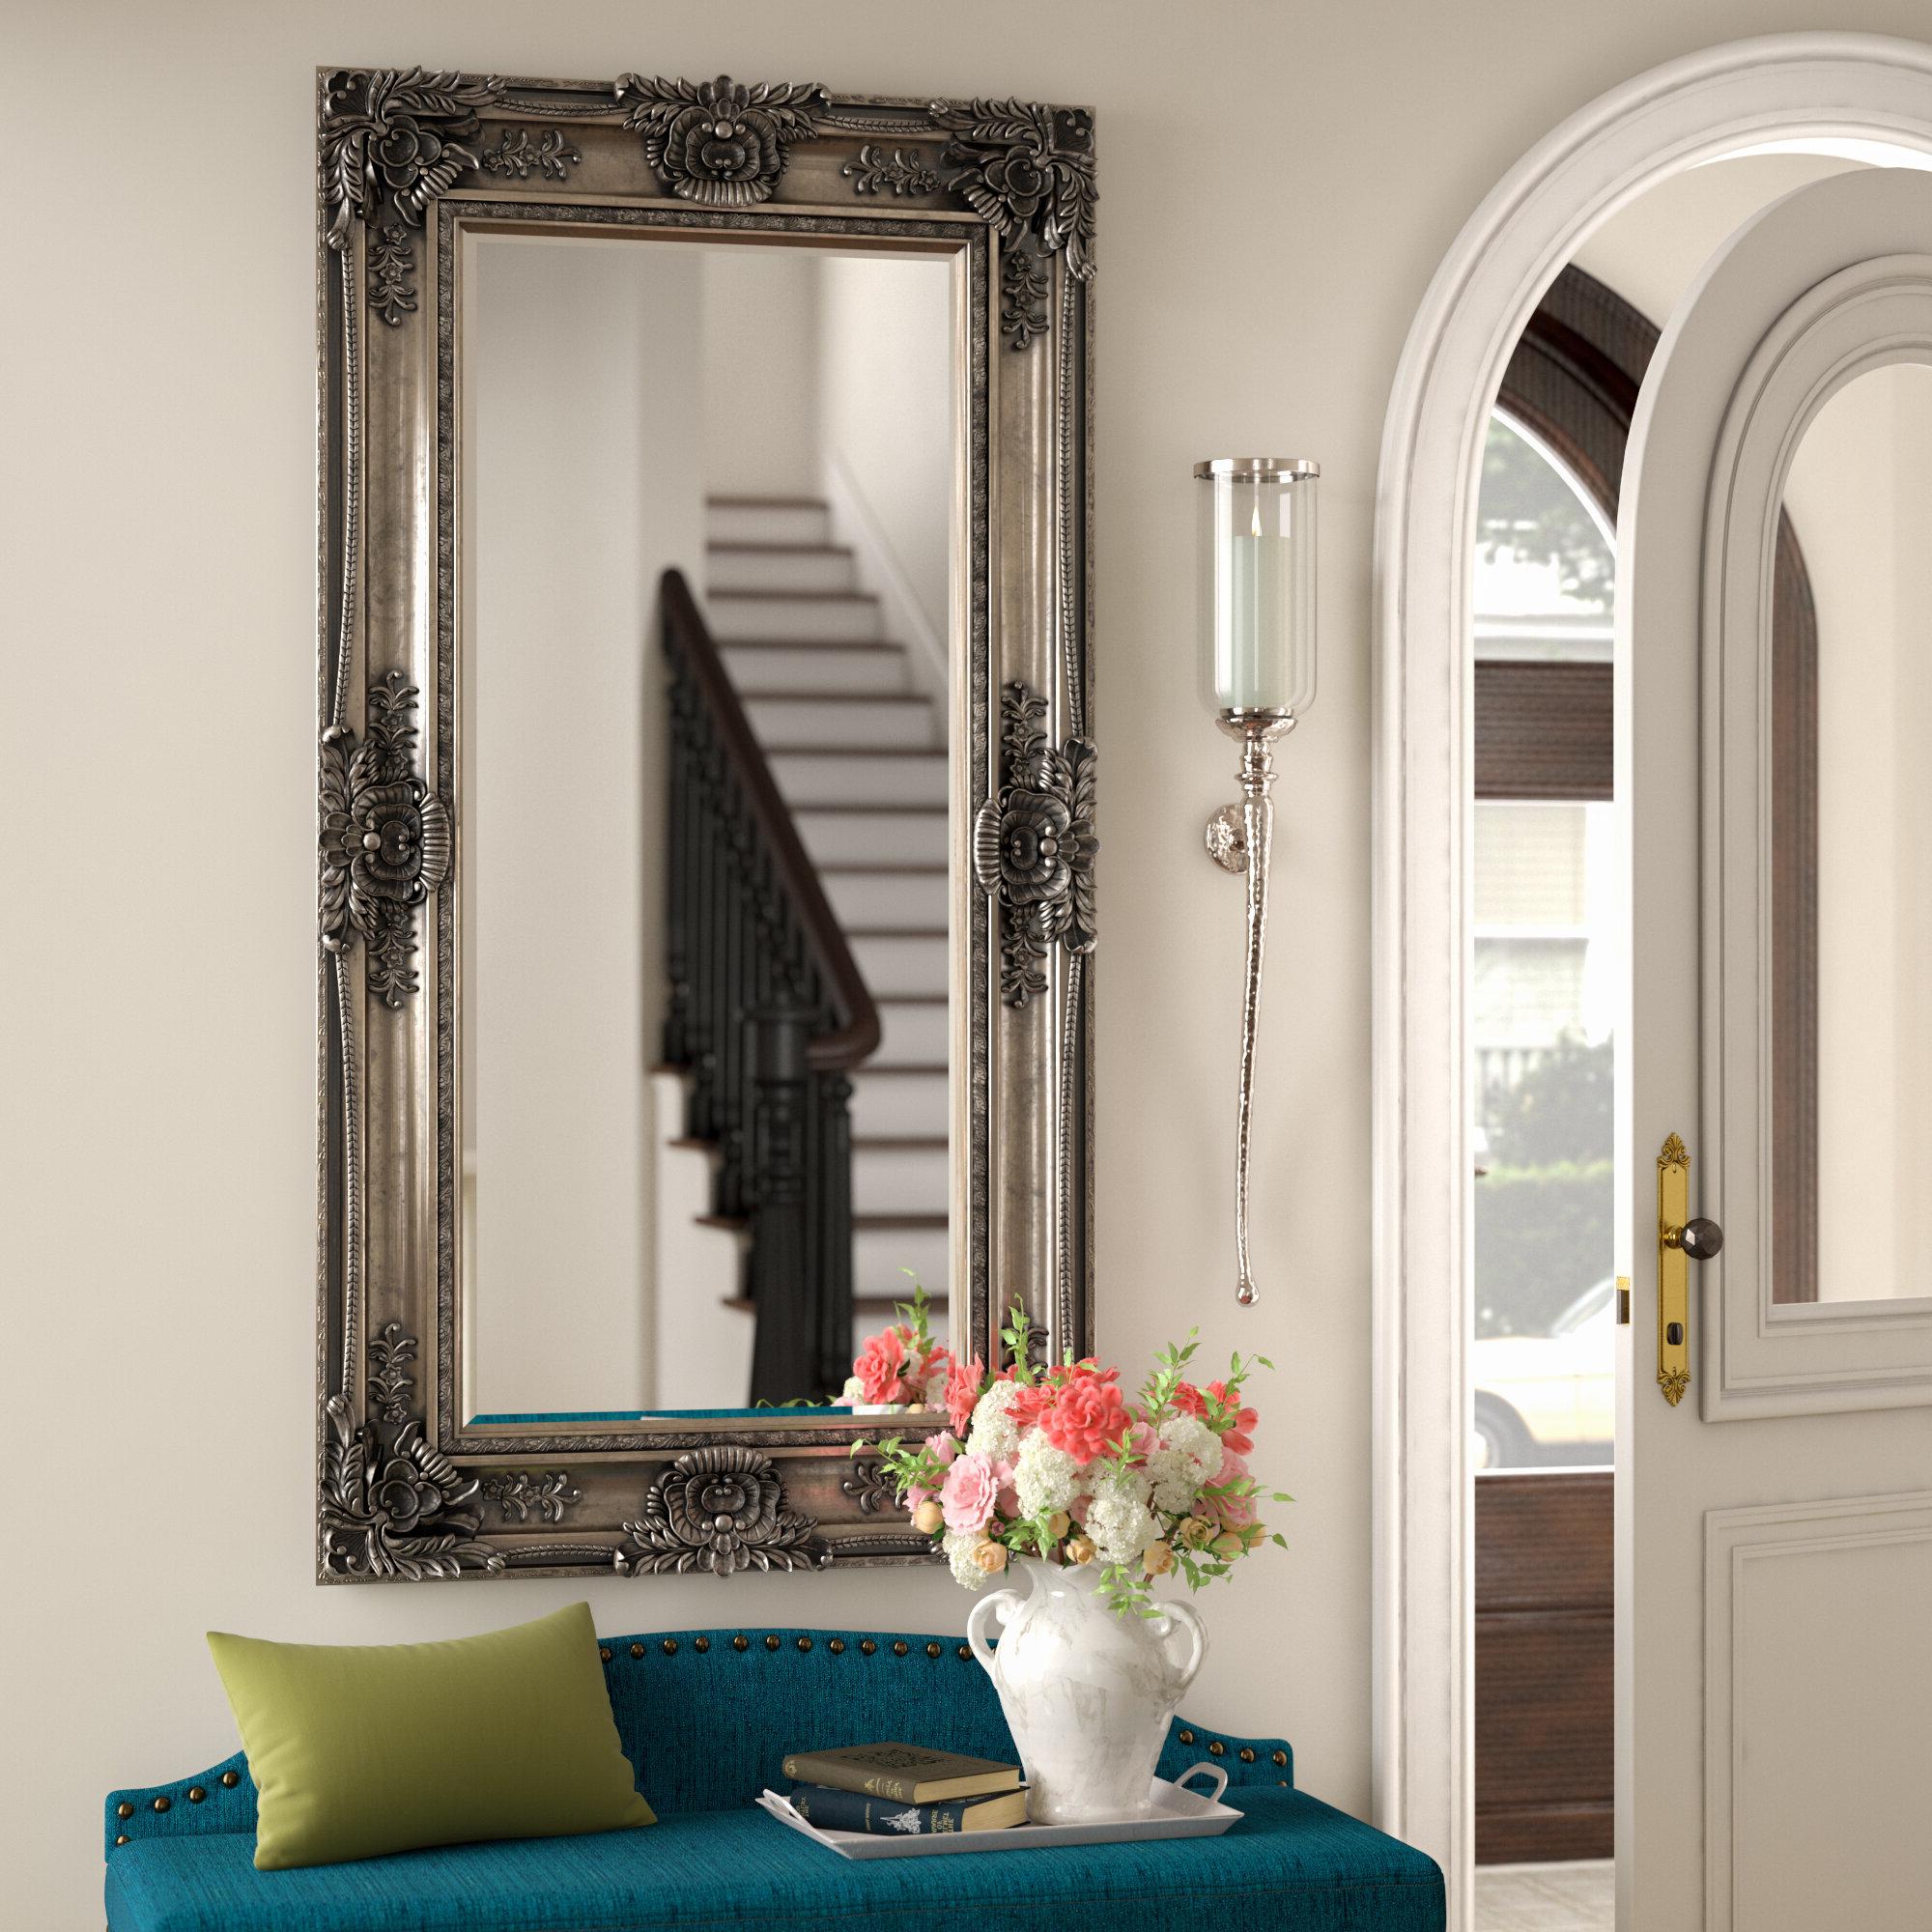 Beaston Leaner Full Length Mirror Intended For Favorite Antique Full Length Wall Mirrors (View 11 of 20)